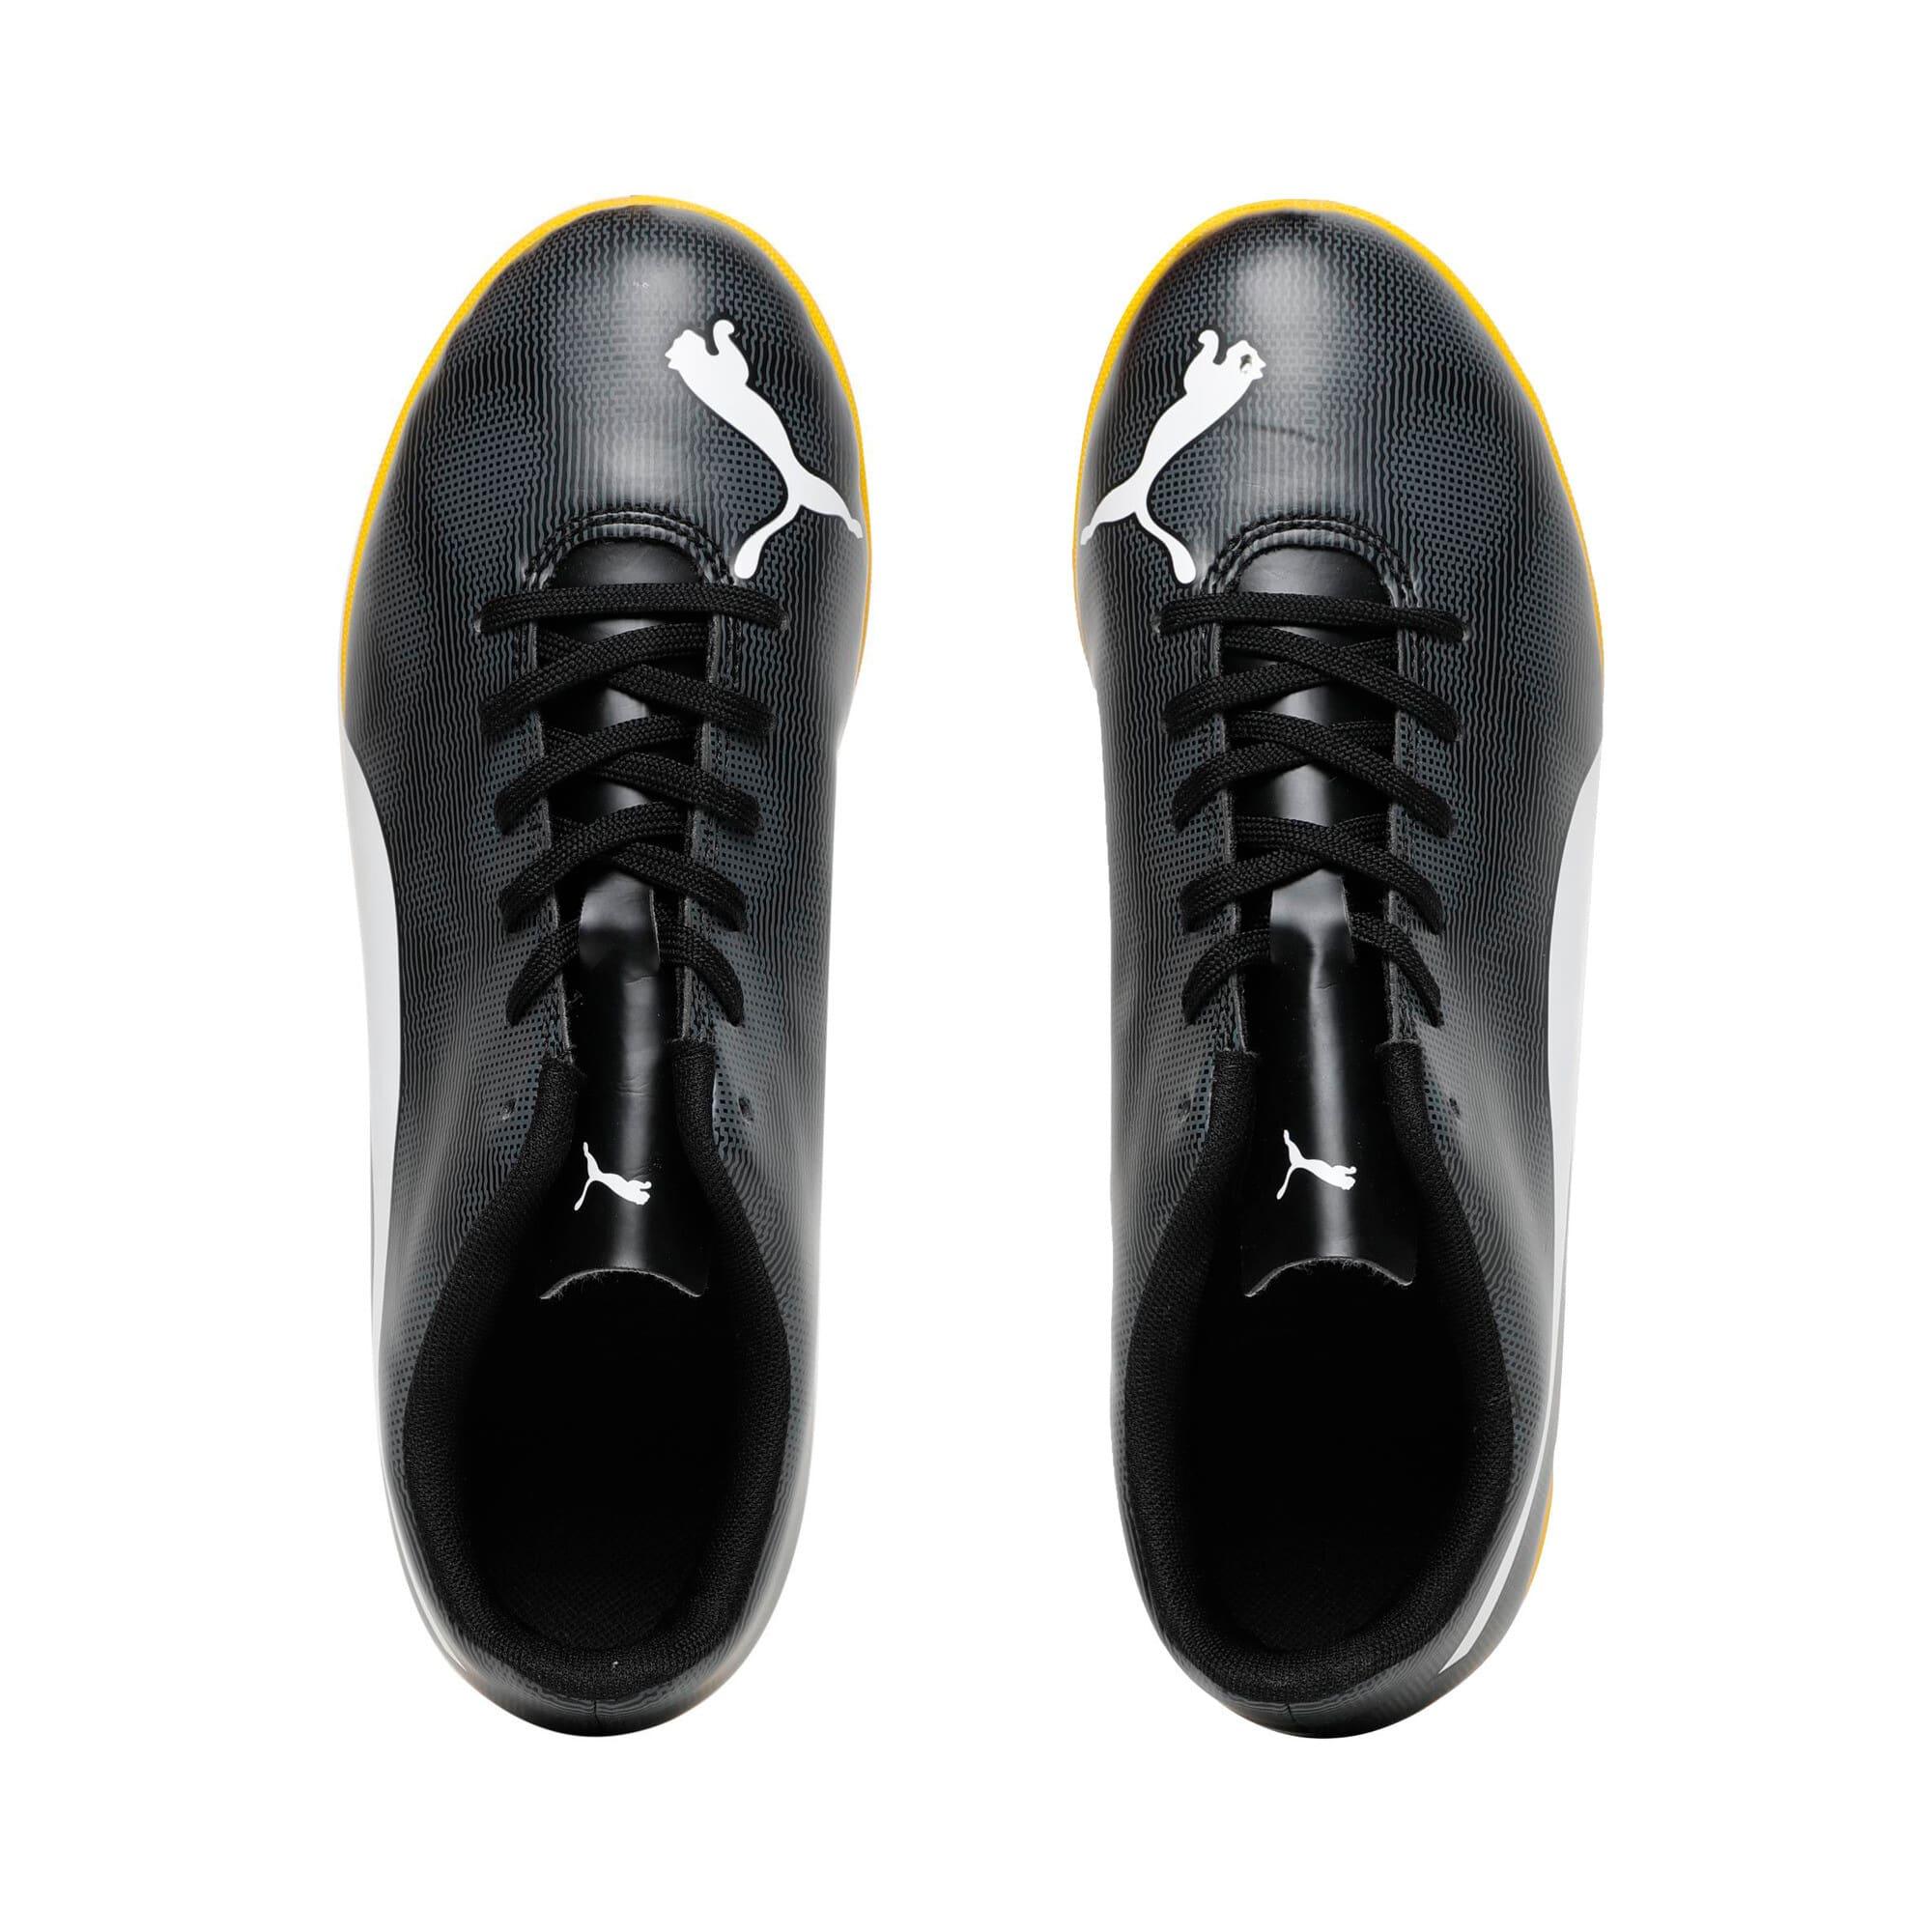 Thumbnail 6 of Rapido IT Youth Football Boots, Black-White-Iron-Yellow, medium-IND